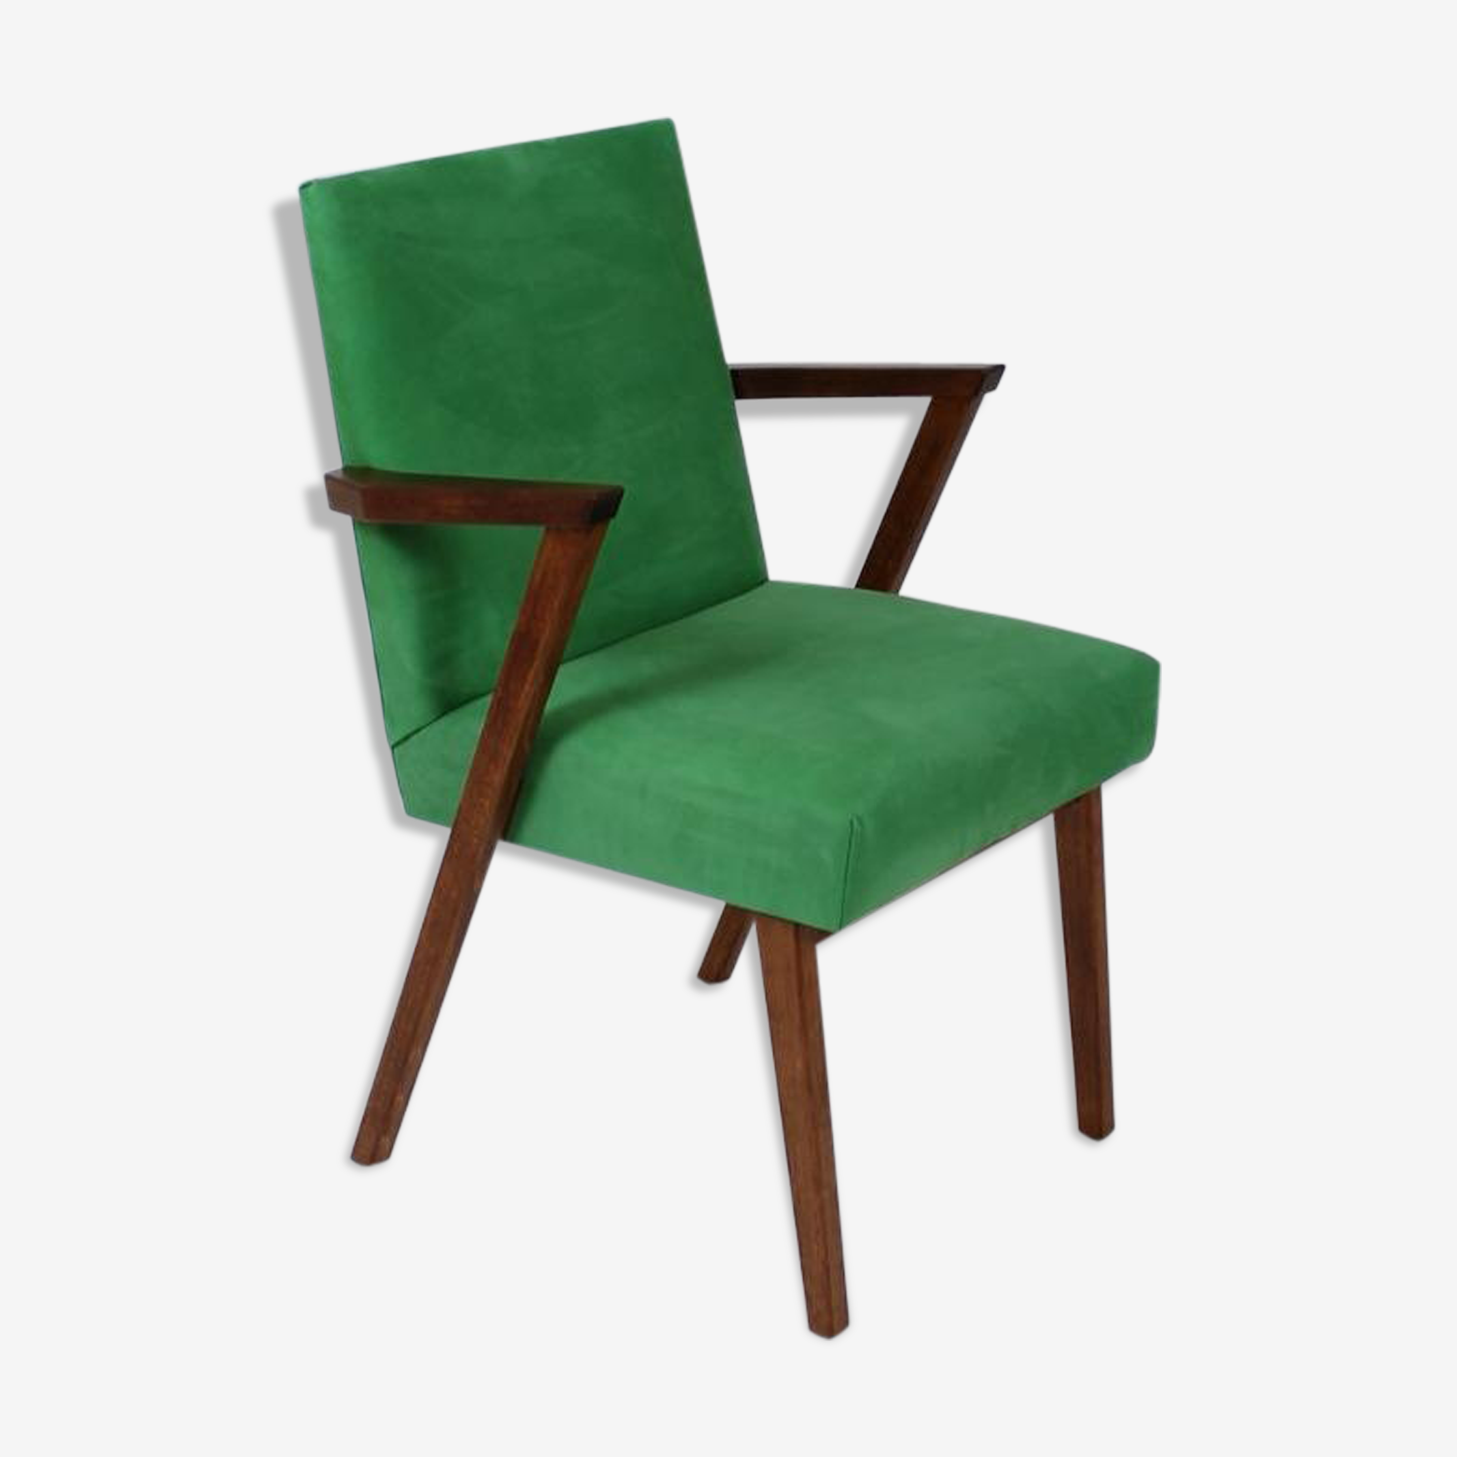 1960 Tijsseling armchair